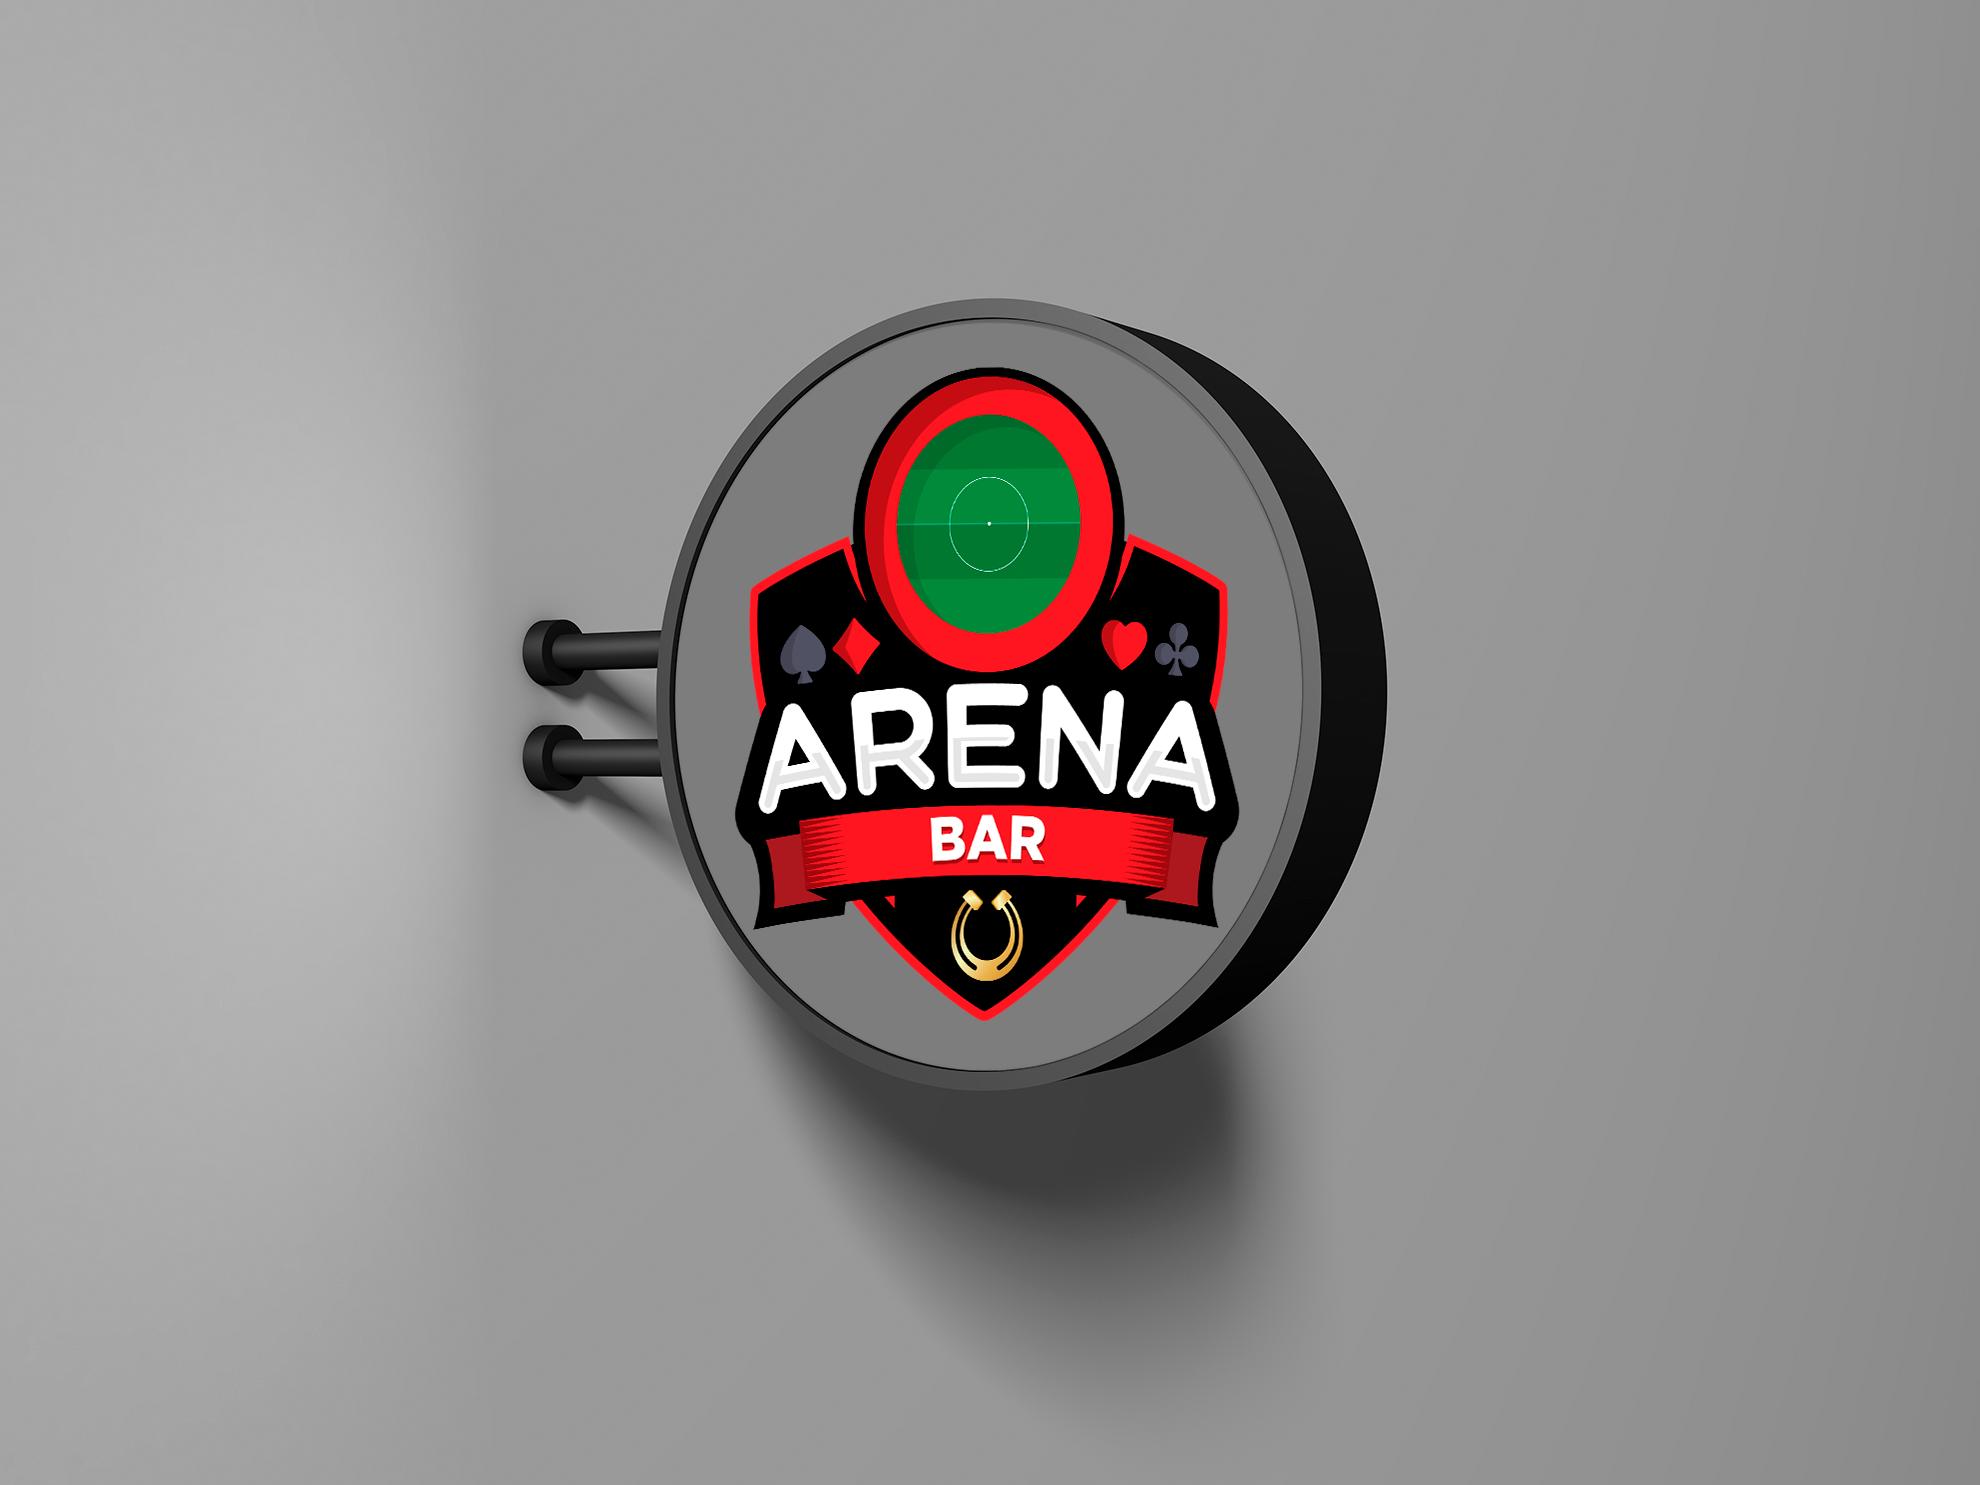 Разработка логотипа для бара! фото f_7785dcaff9972c53.png